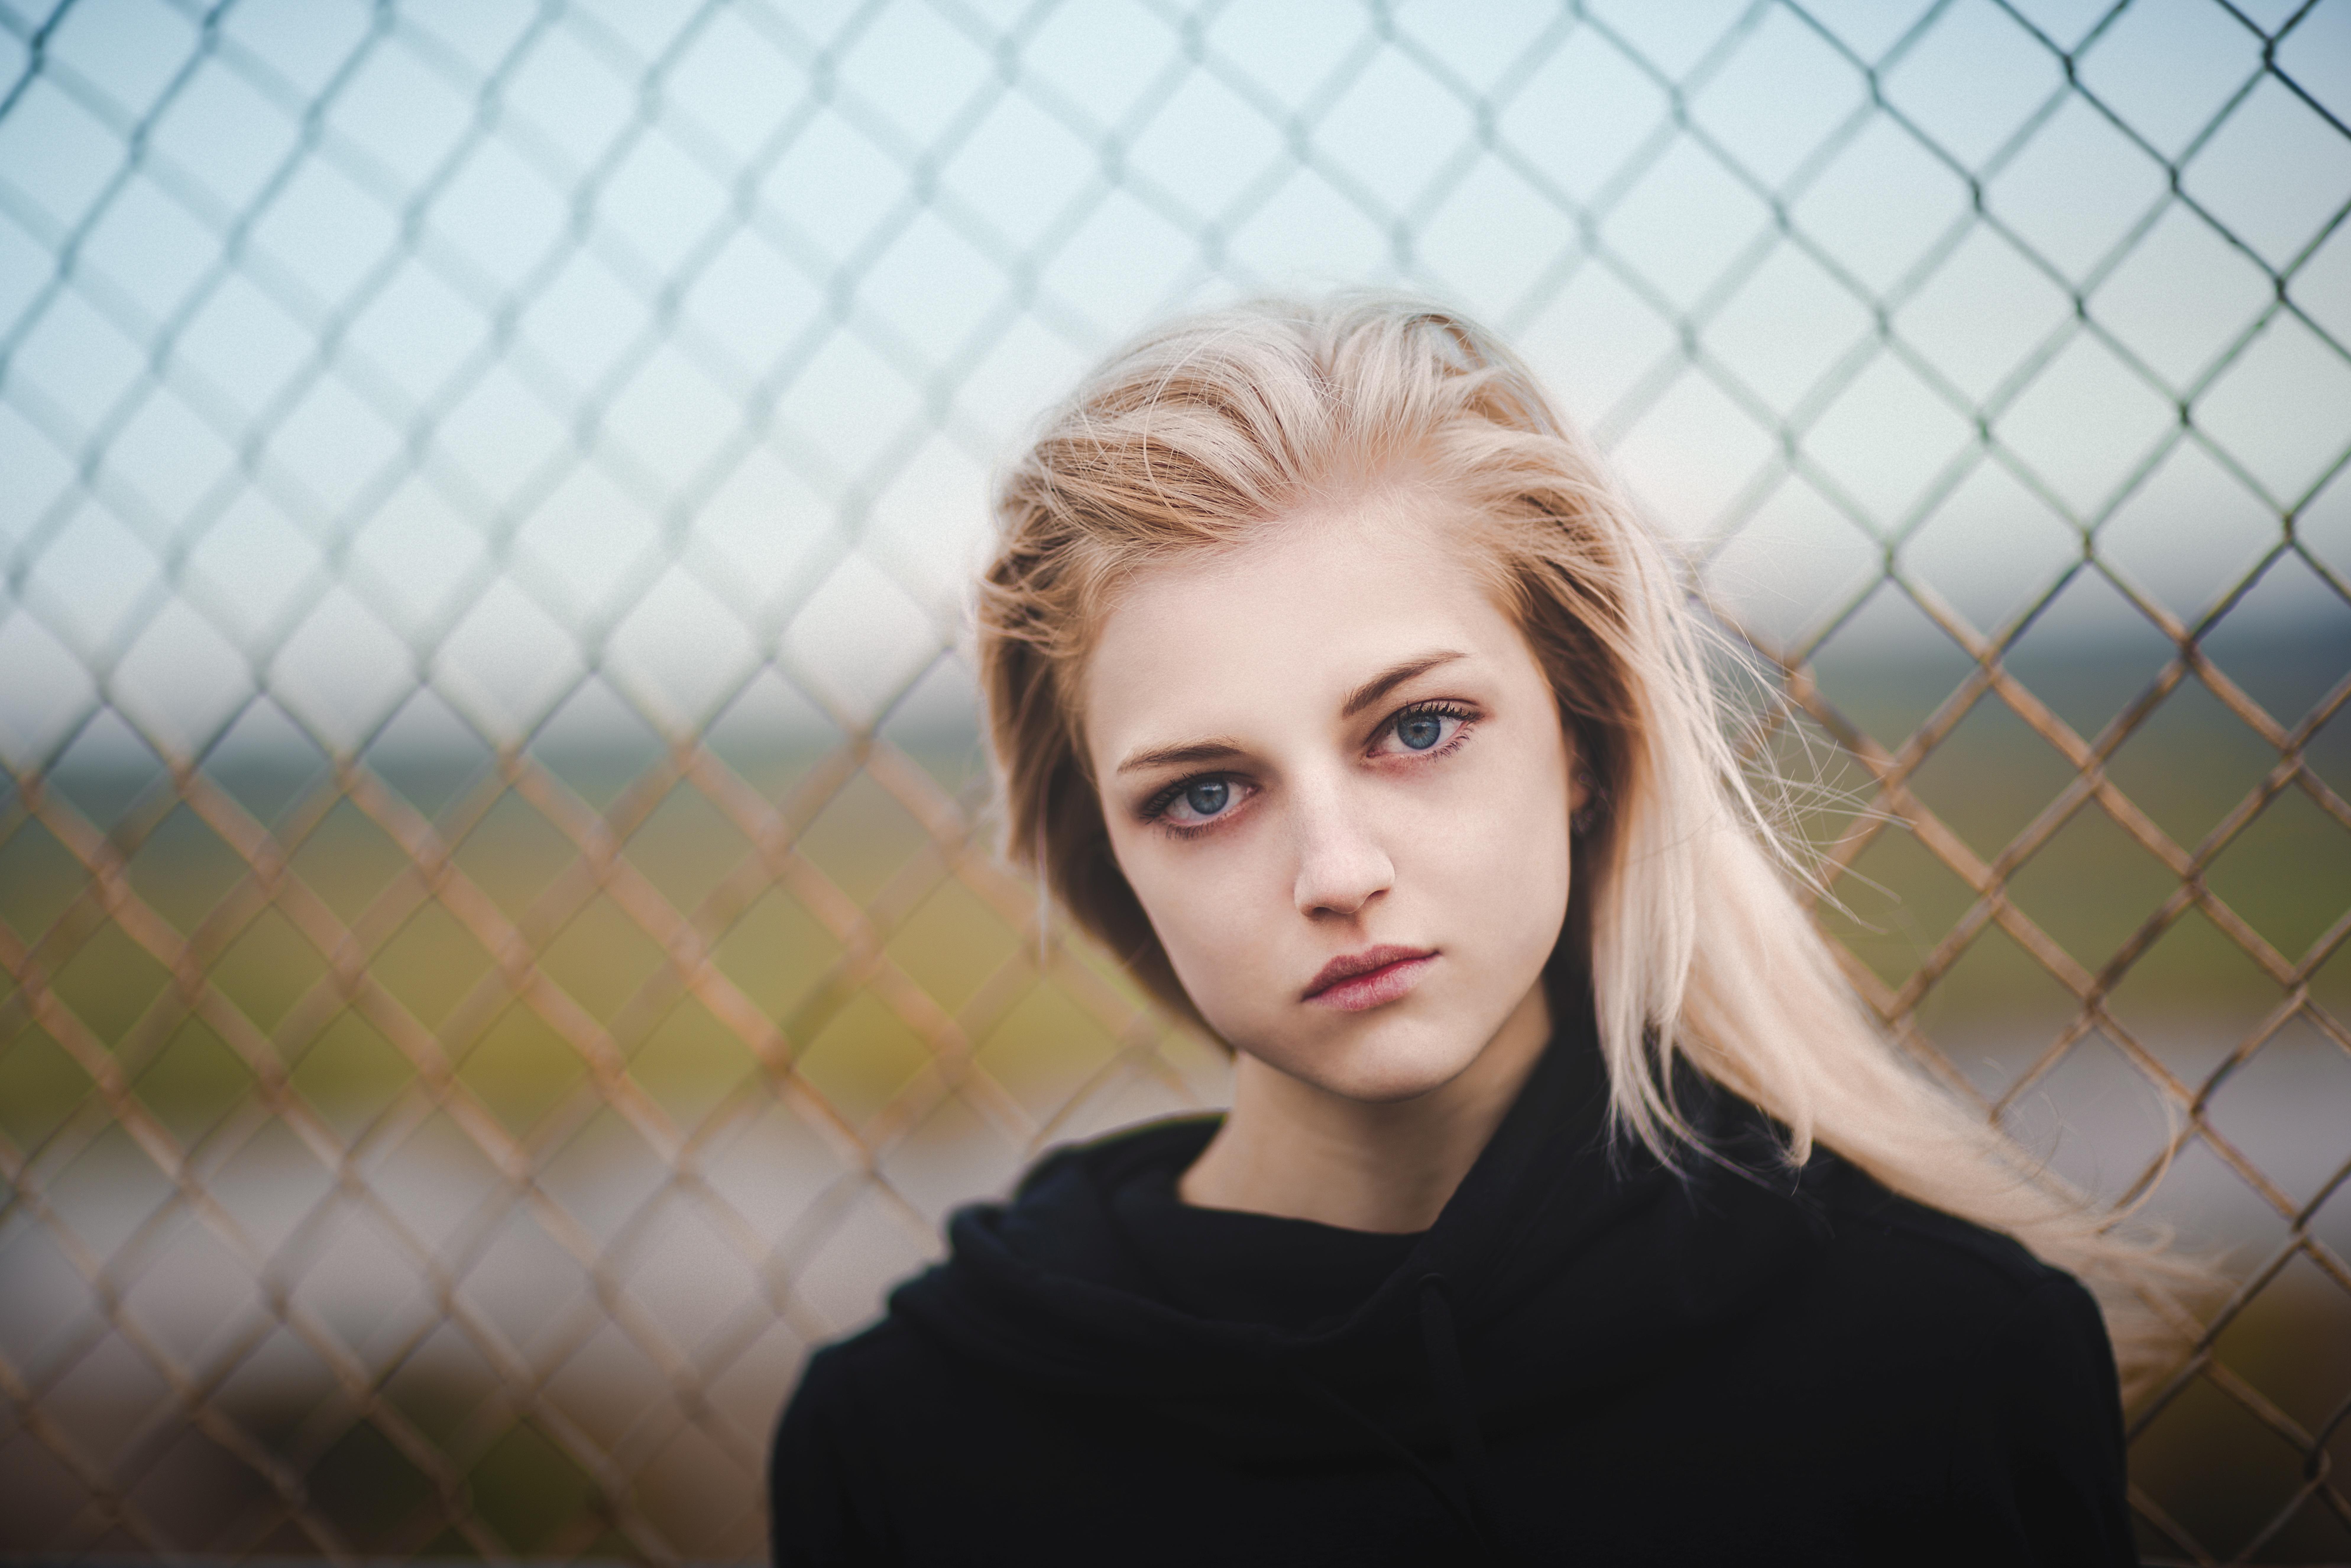 People 7952x5304 women model portrait blonde blue eyes looking at viewer black shirt fence Ilya Arte